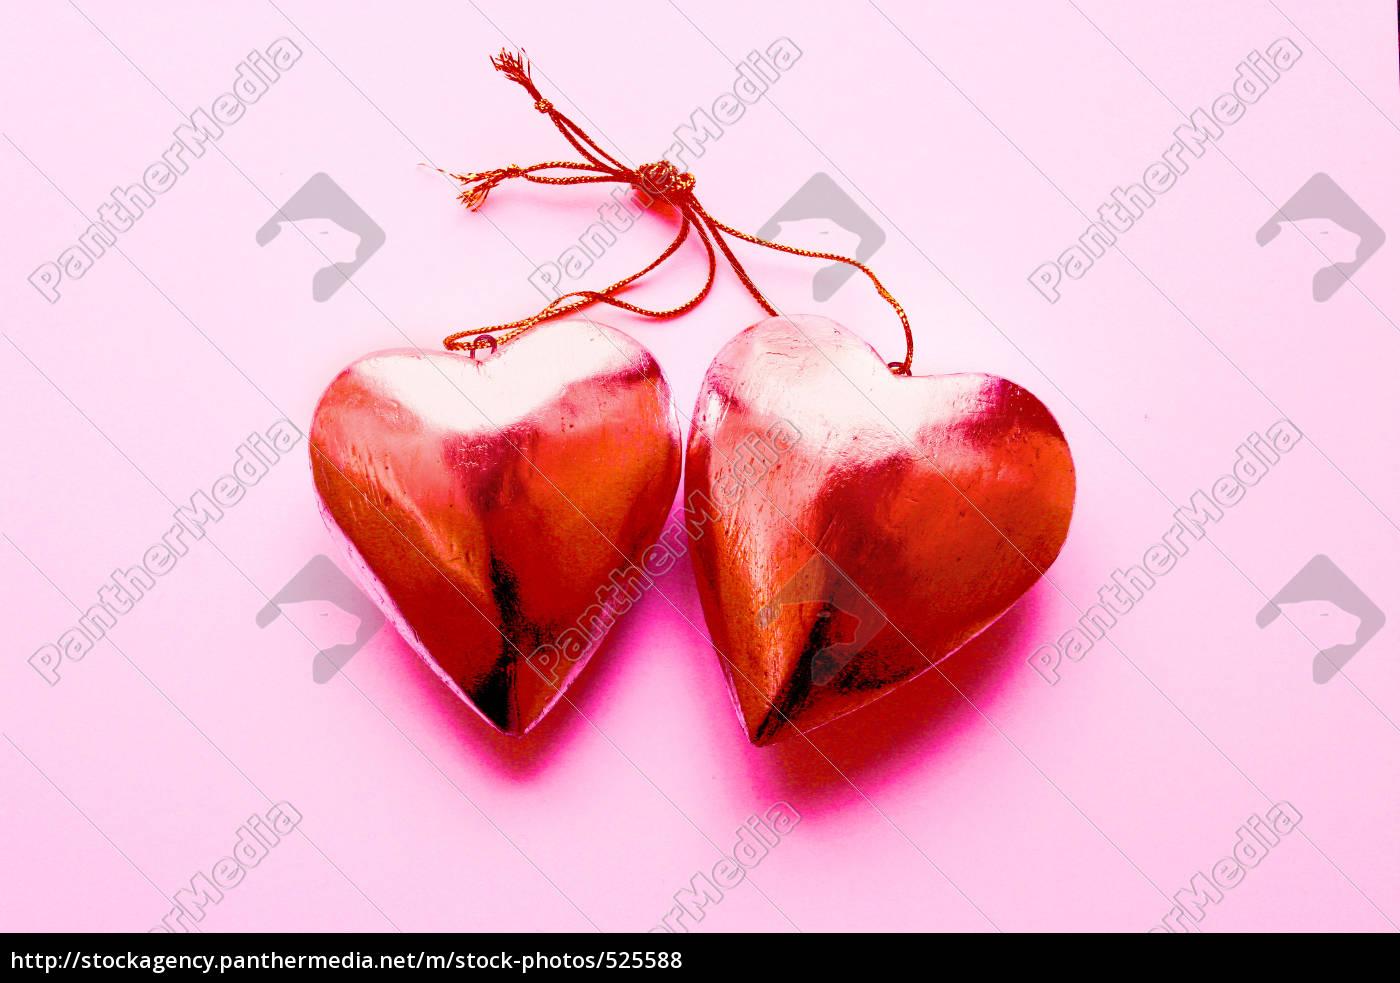 heart - 525588